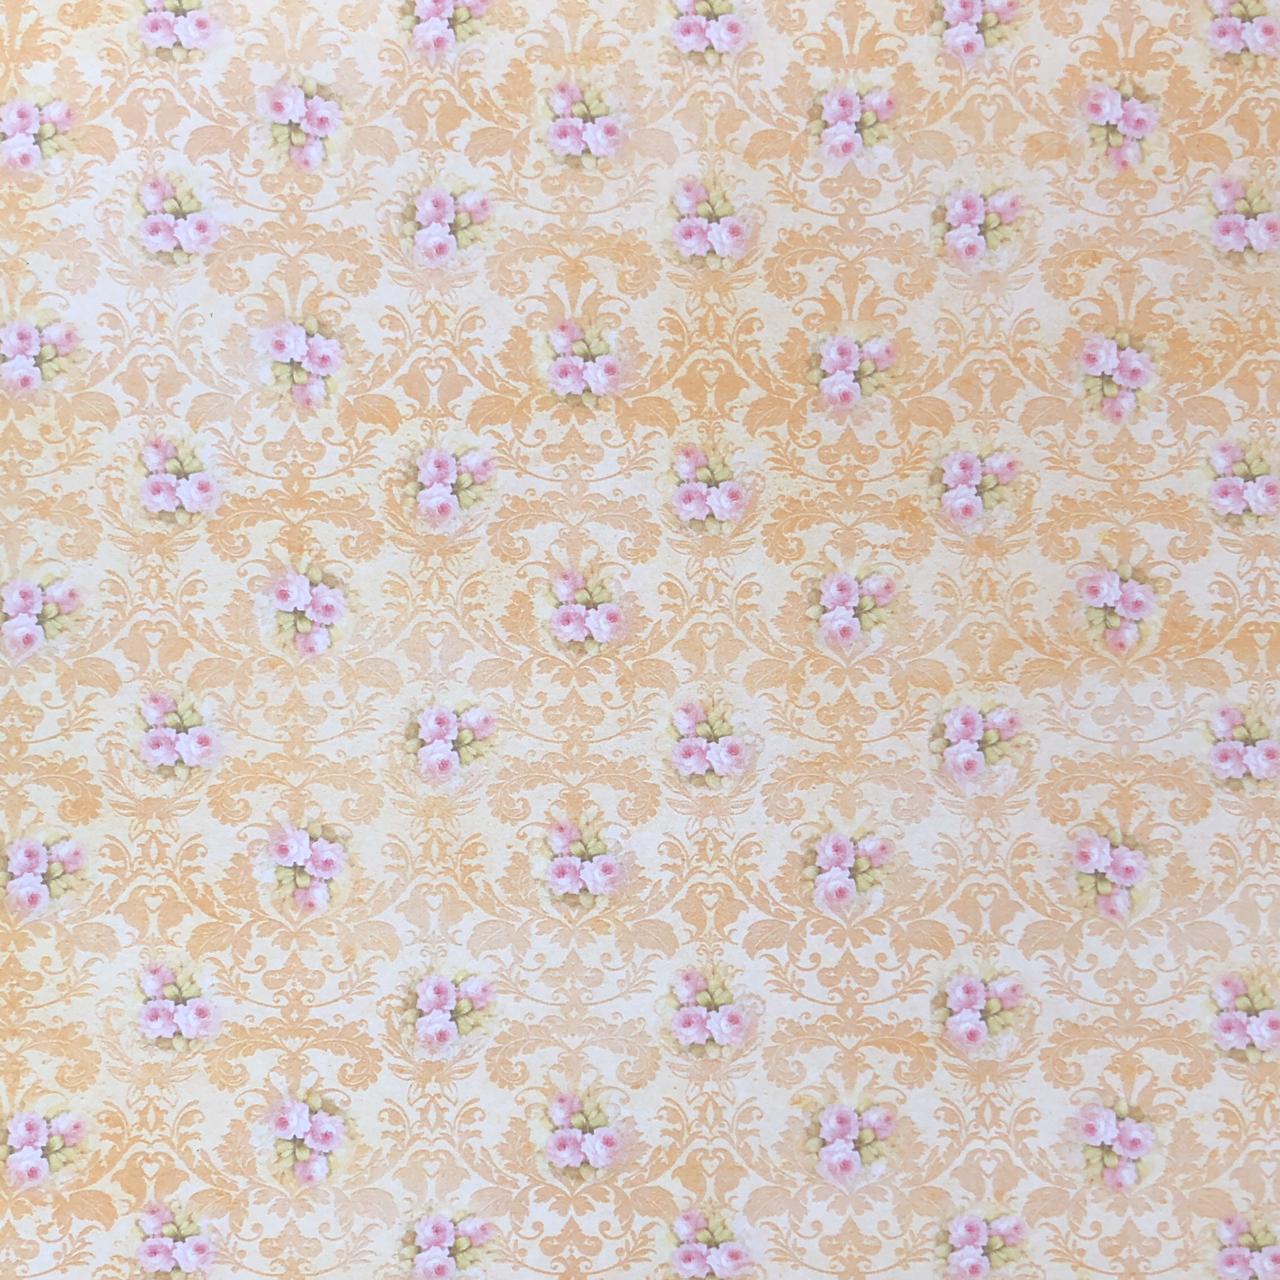 Bloco de Papéis Coordenados 20 x 20 cm - Amarelo - Arte Fácil